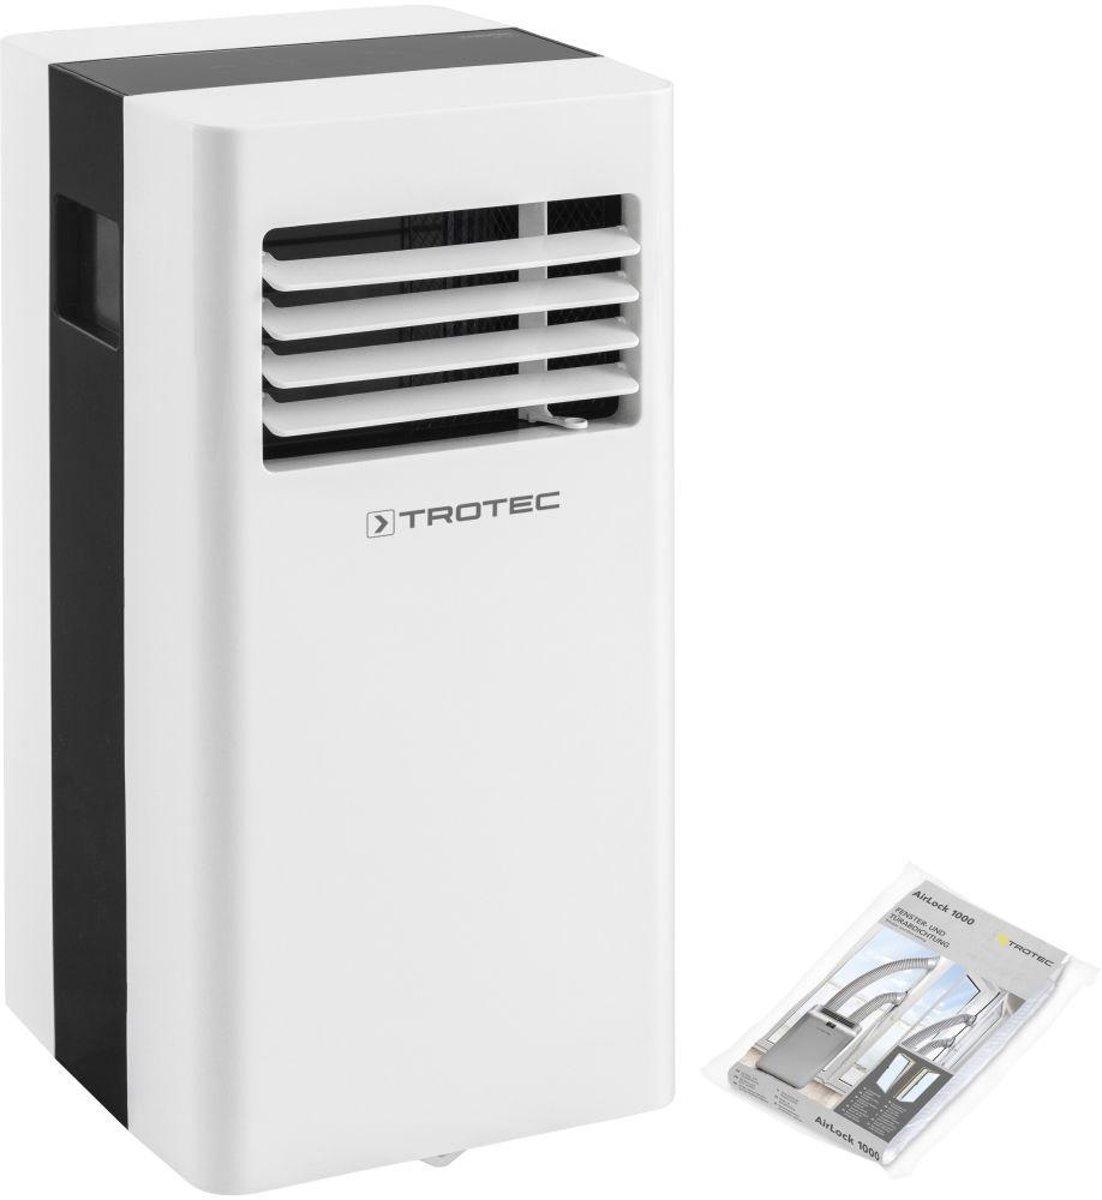 TROTEC Mobiele airco PAC 2600 X & AirLock 1000 kopen